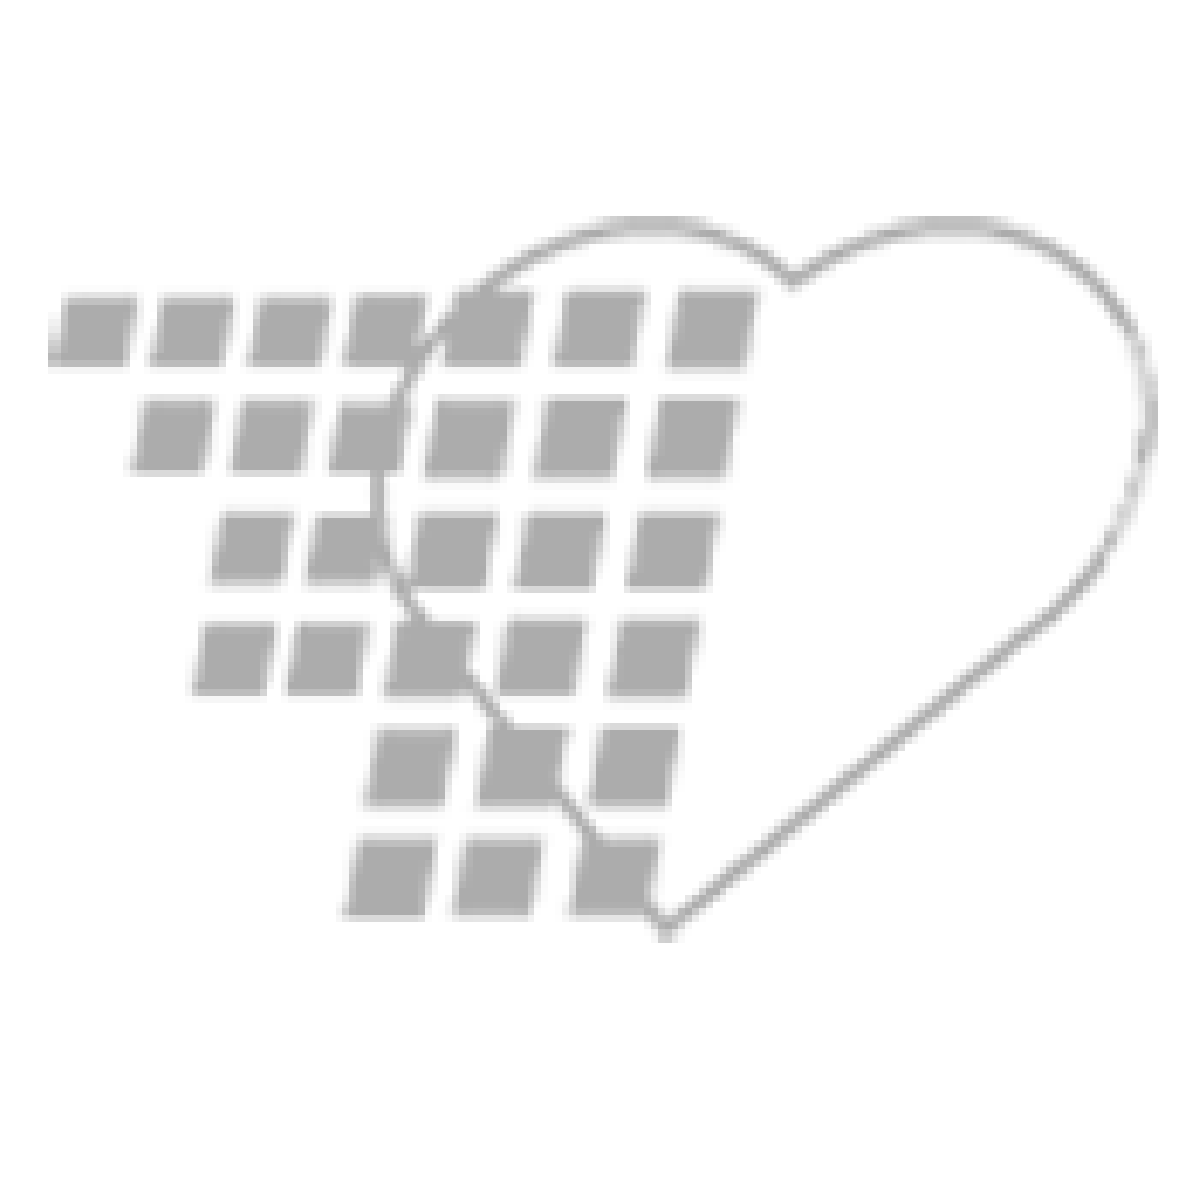 BOGOAC2P FREE CASE IV FLUID WITH ALARIS MEDLEY COMBO PURCHASE